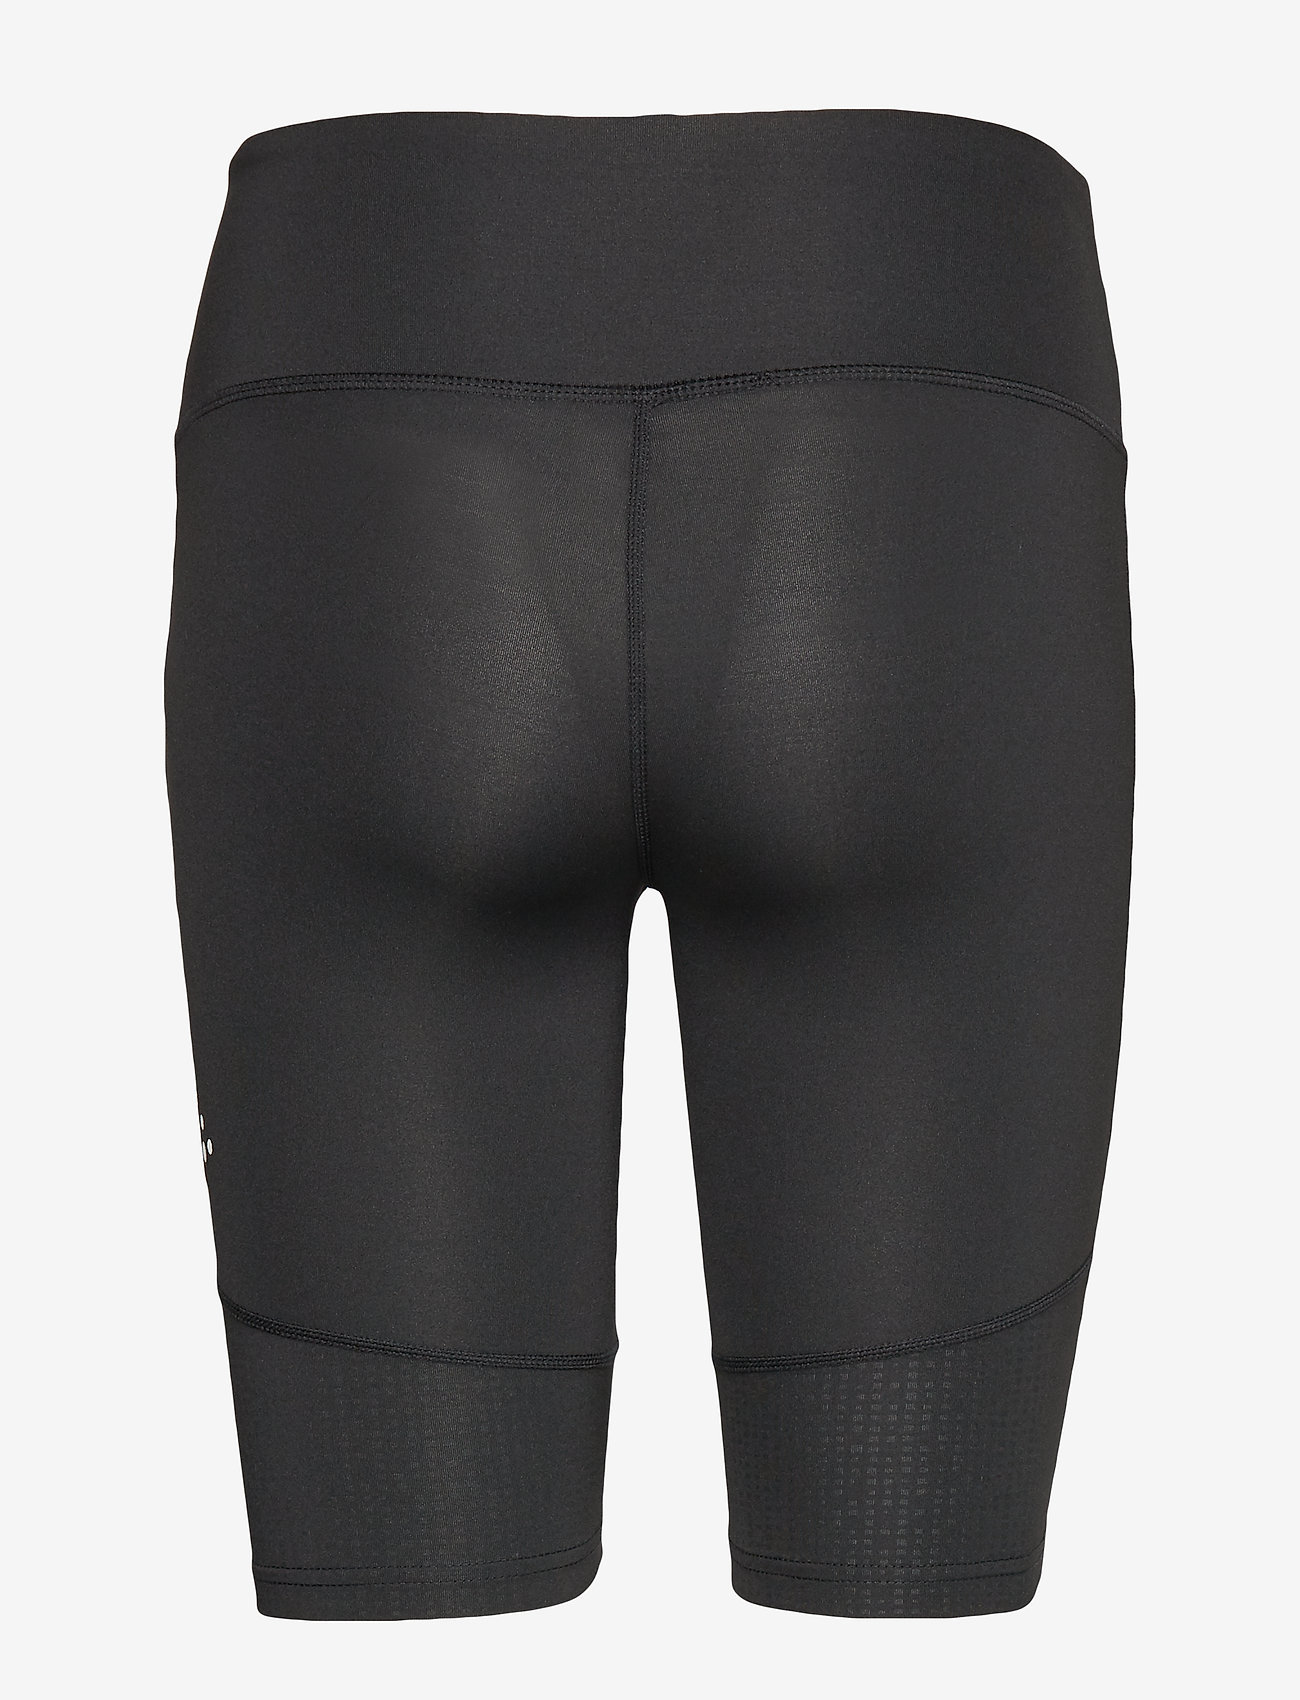 Craft - Rush Short Tights W - träningsshorts - black - 1